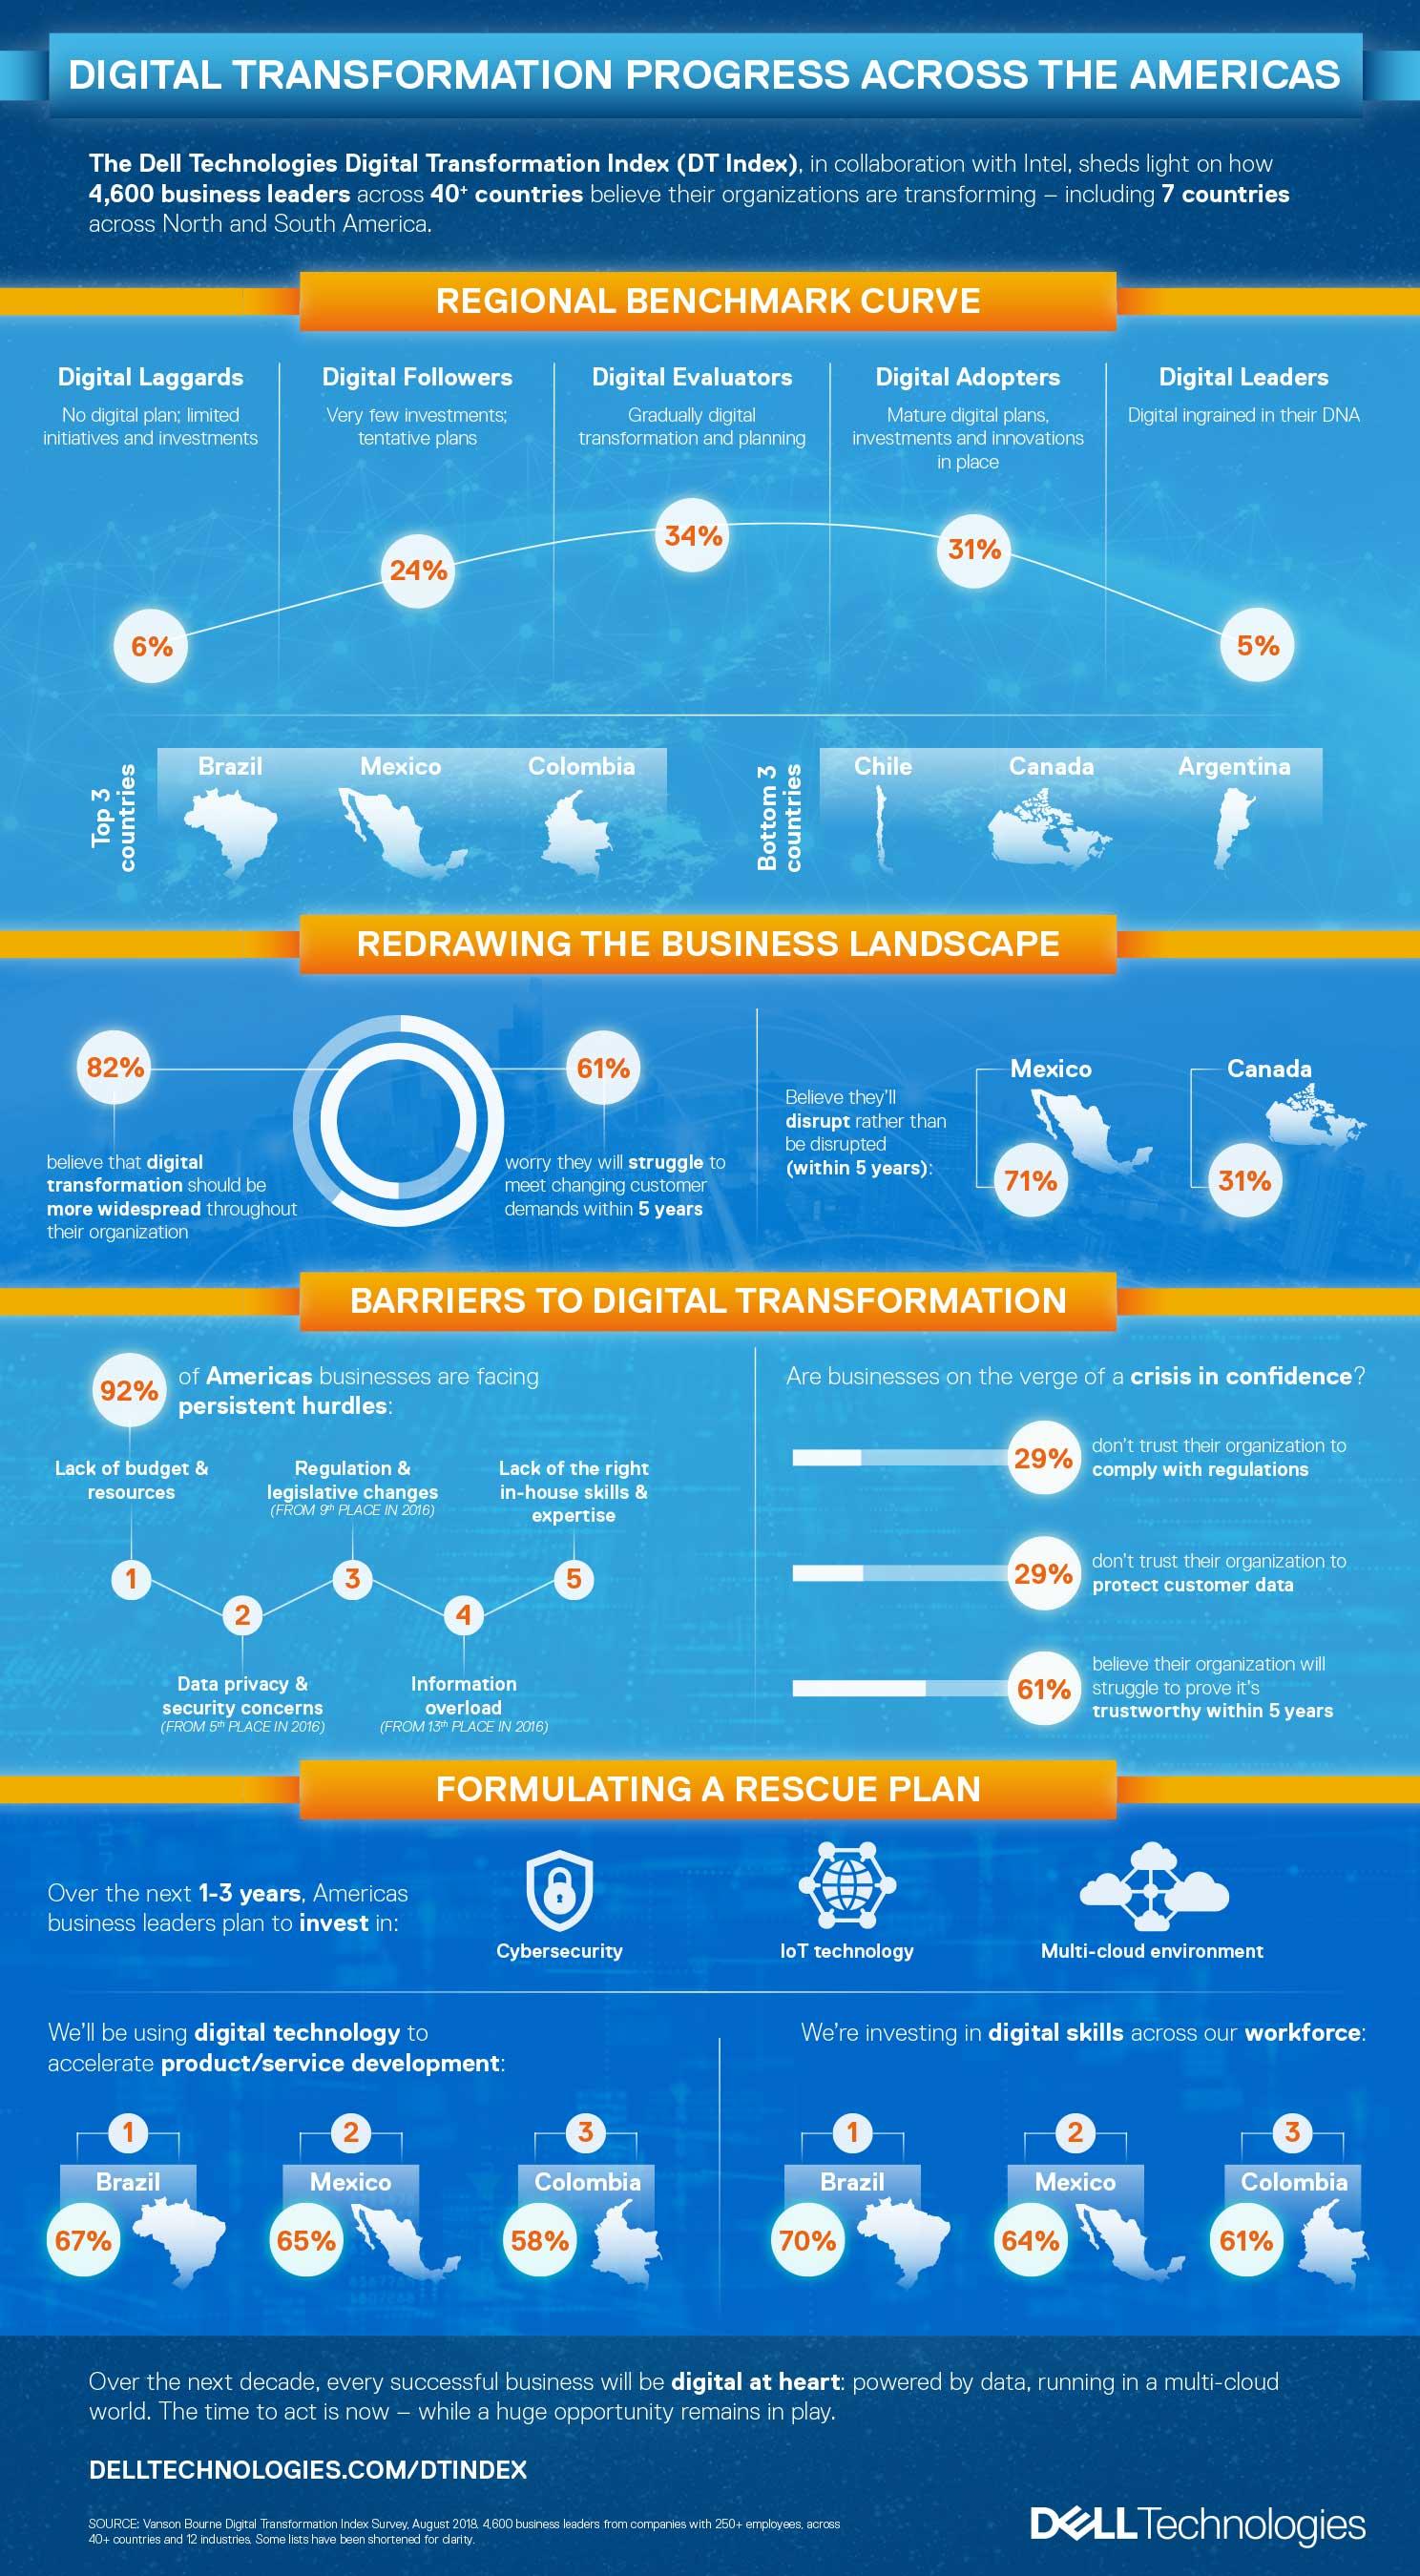 Digital transformation progress across the Americas